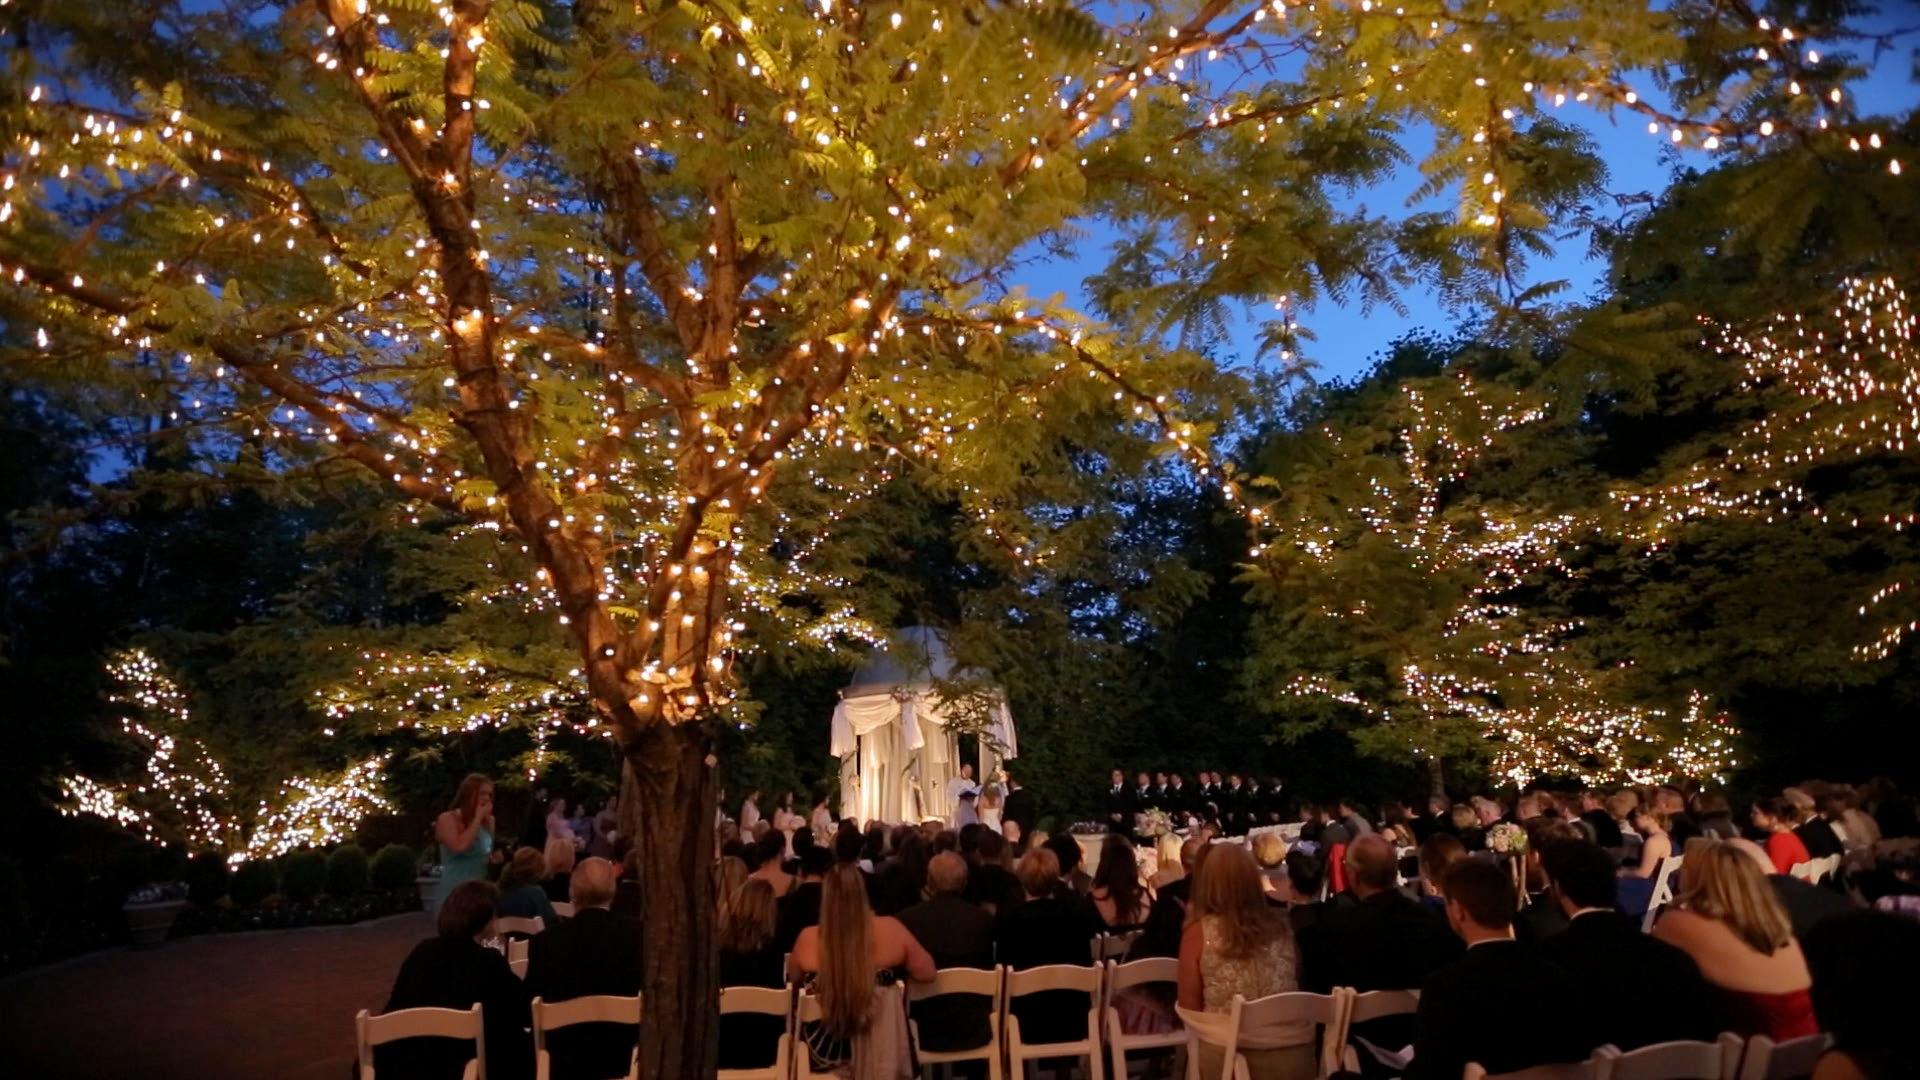 wedding outdoor lights photo - 4